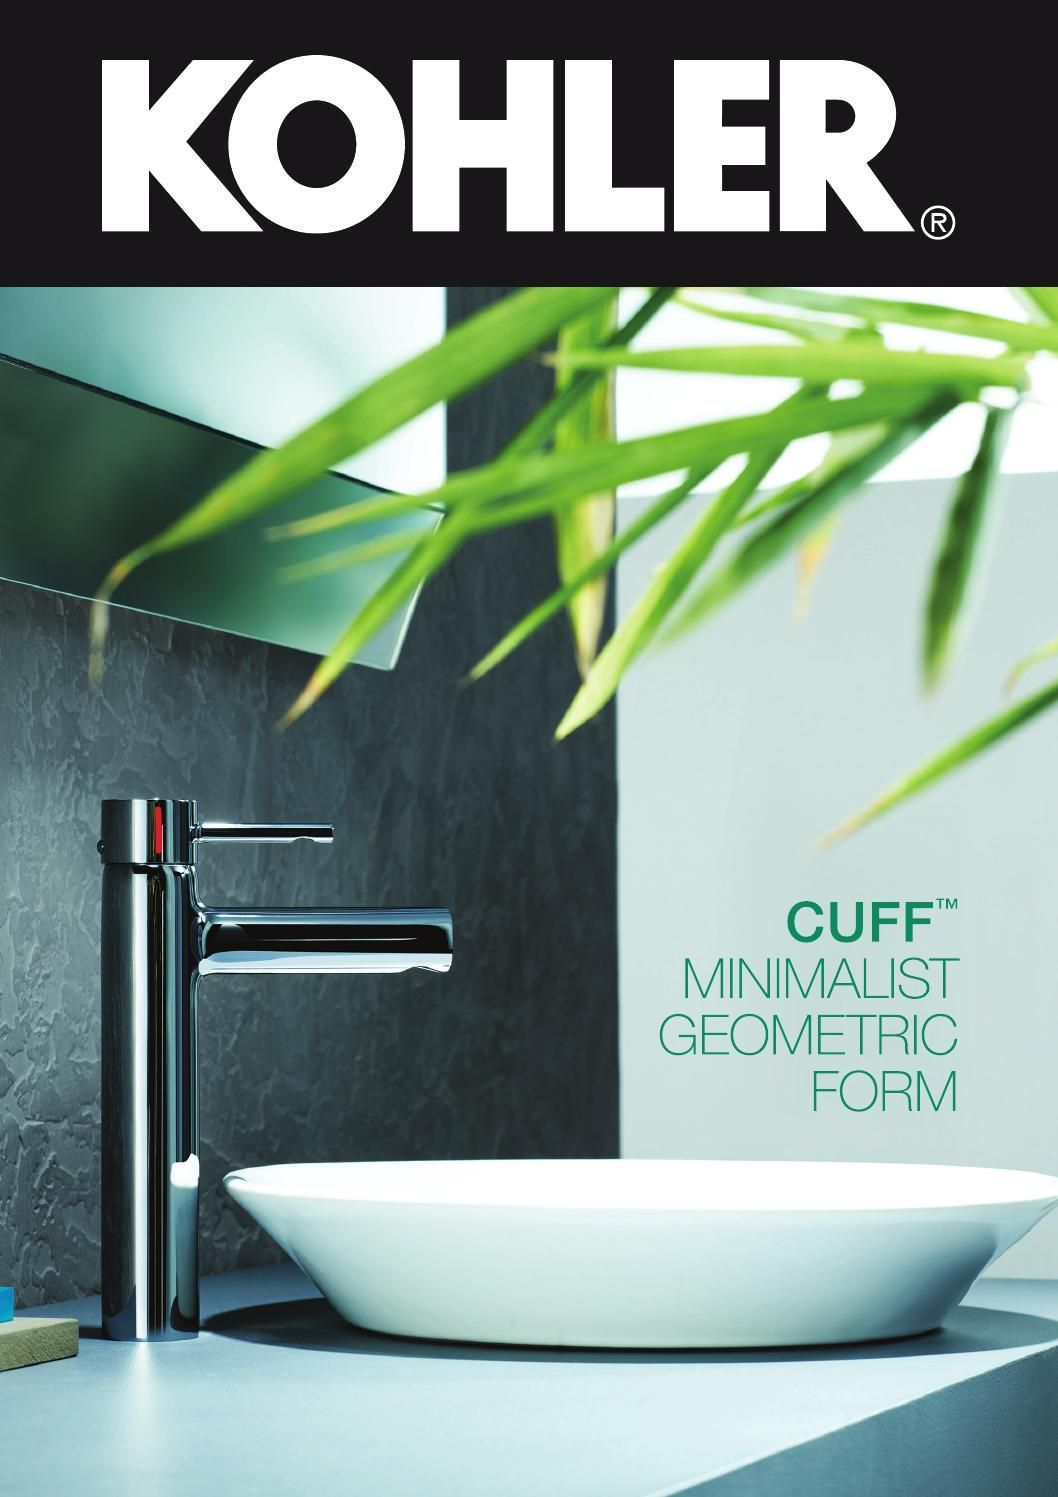 Kohler Cuff Flyer | Pinterest | Hardware